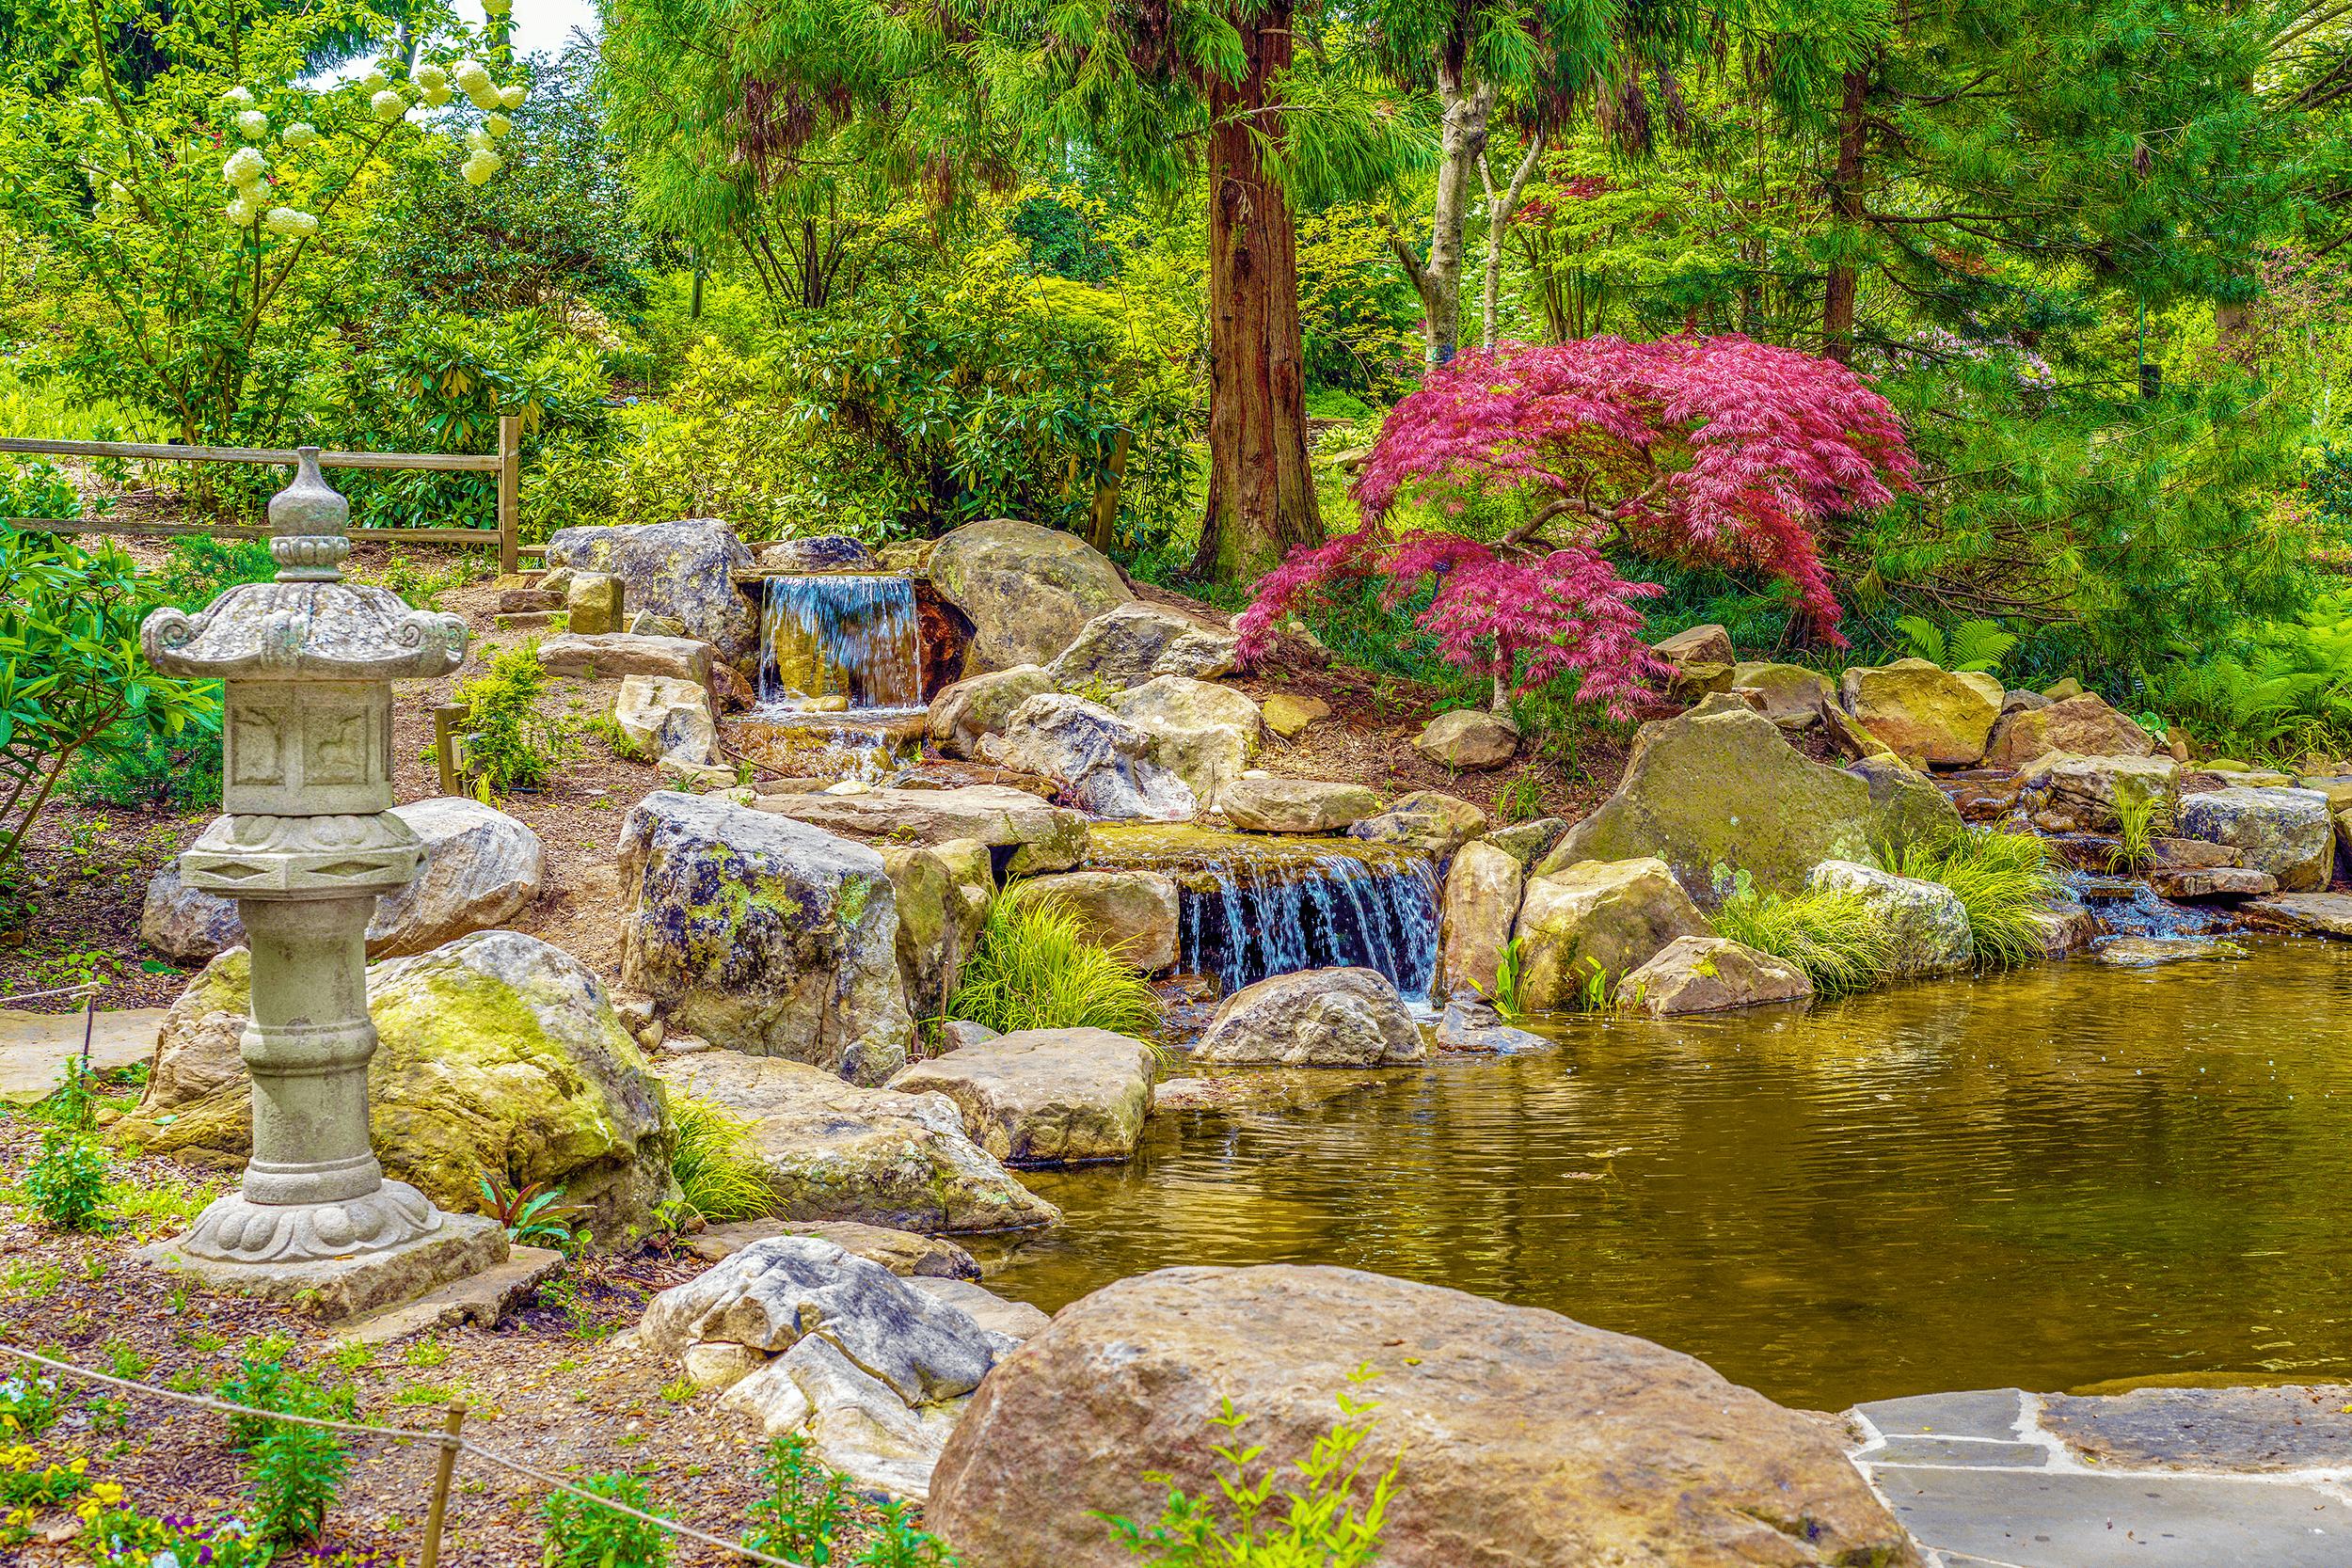 Enjoy the serenity of this beautiful garden.